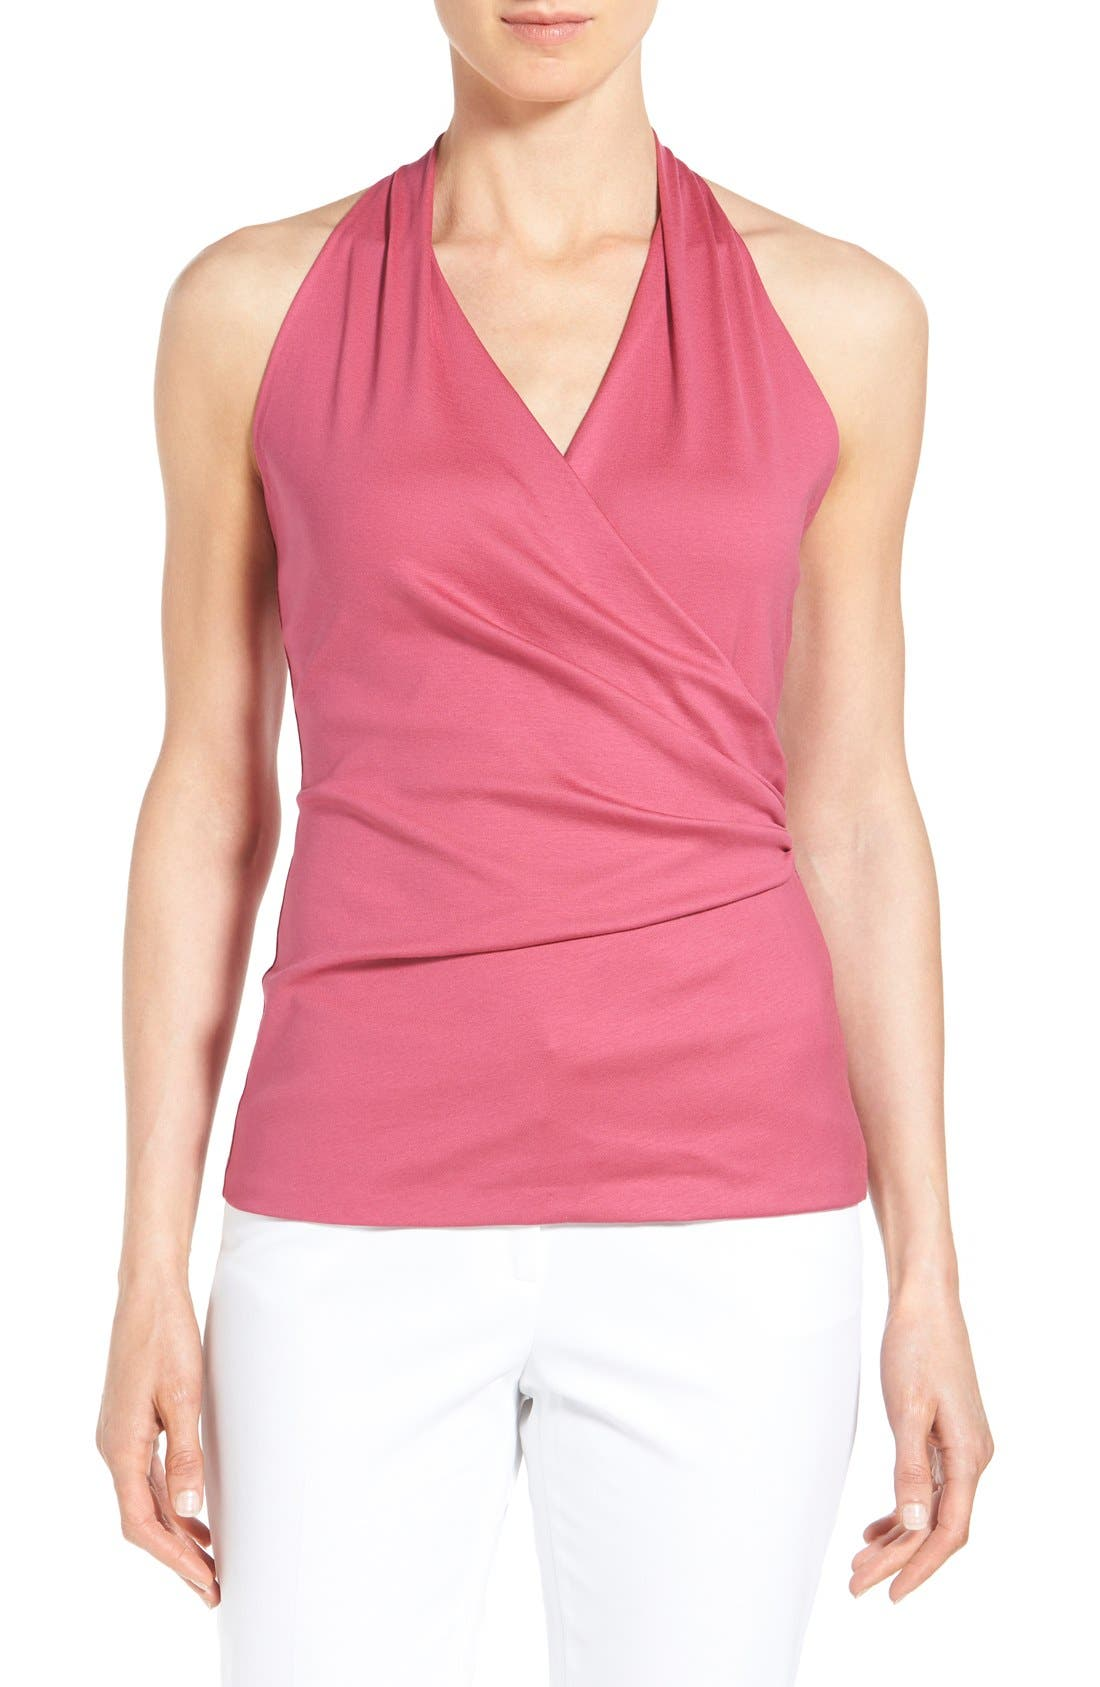 Alternate Image 1 Selected - Lafayette 148 New York Shirred Faux Wrap Top (Regular & Petite)